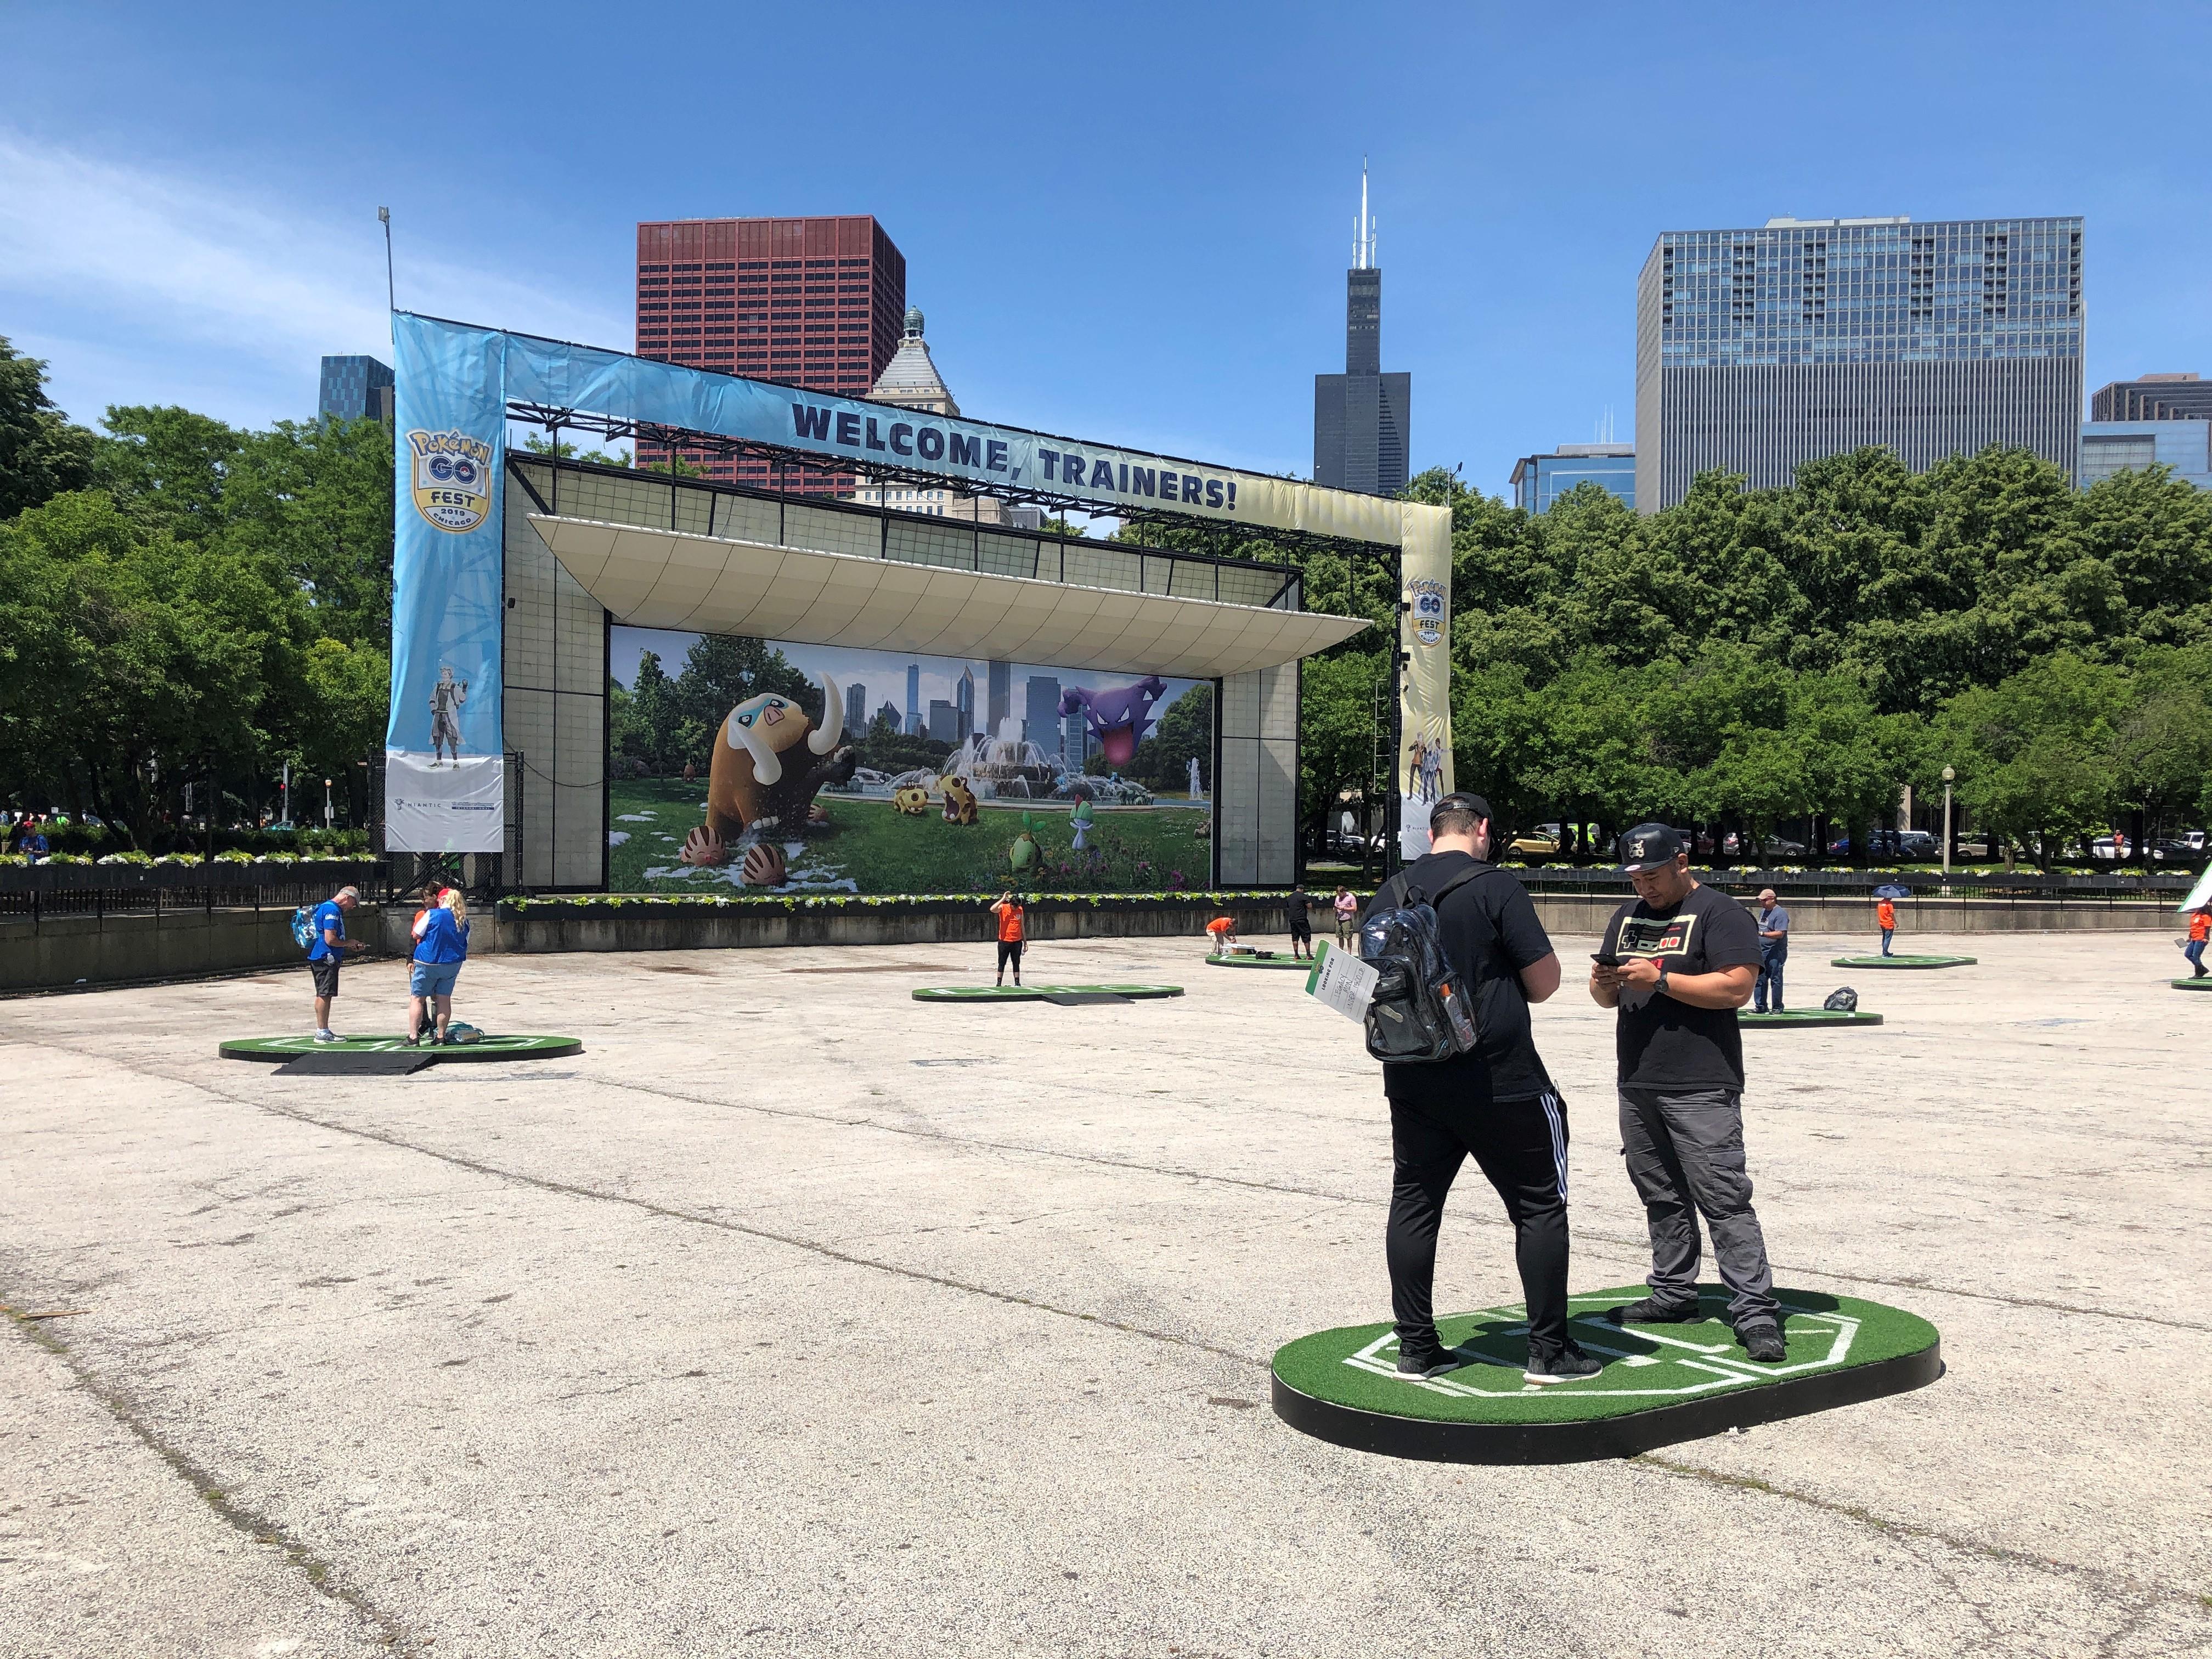 GO Fest Chicago 2019 - A GamePress Experience | Pokemon GO Wiki